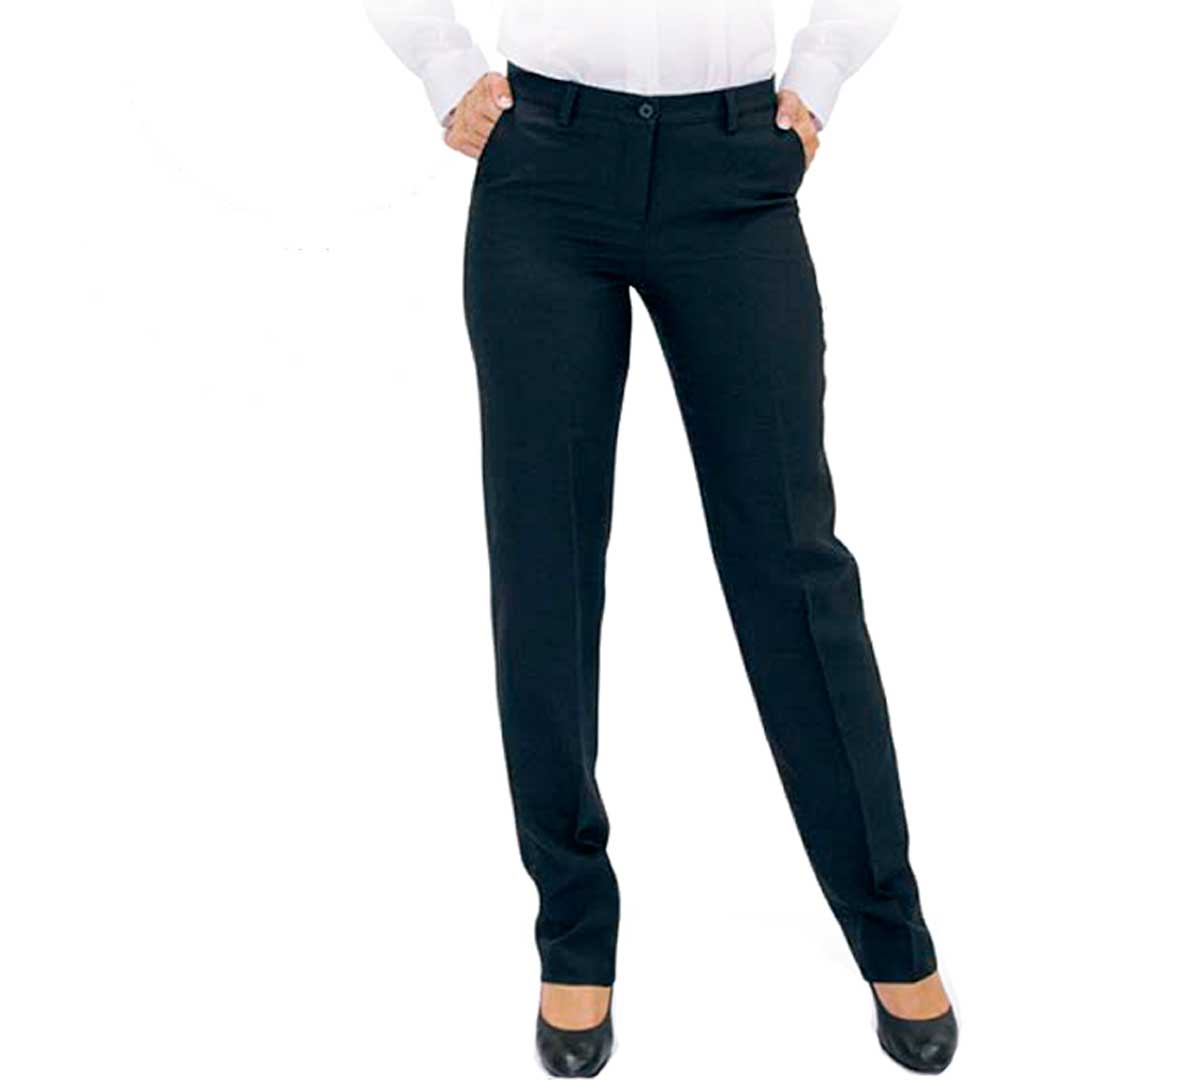 Pantalon Elastico De Mujer Dacobel S 21 6173 Elastico Azul